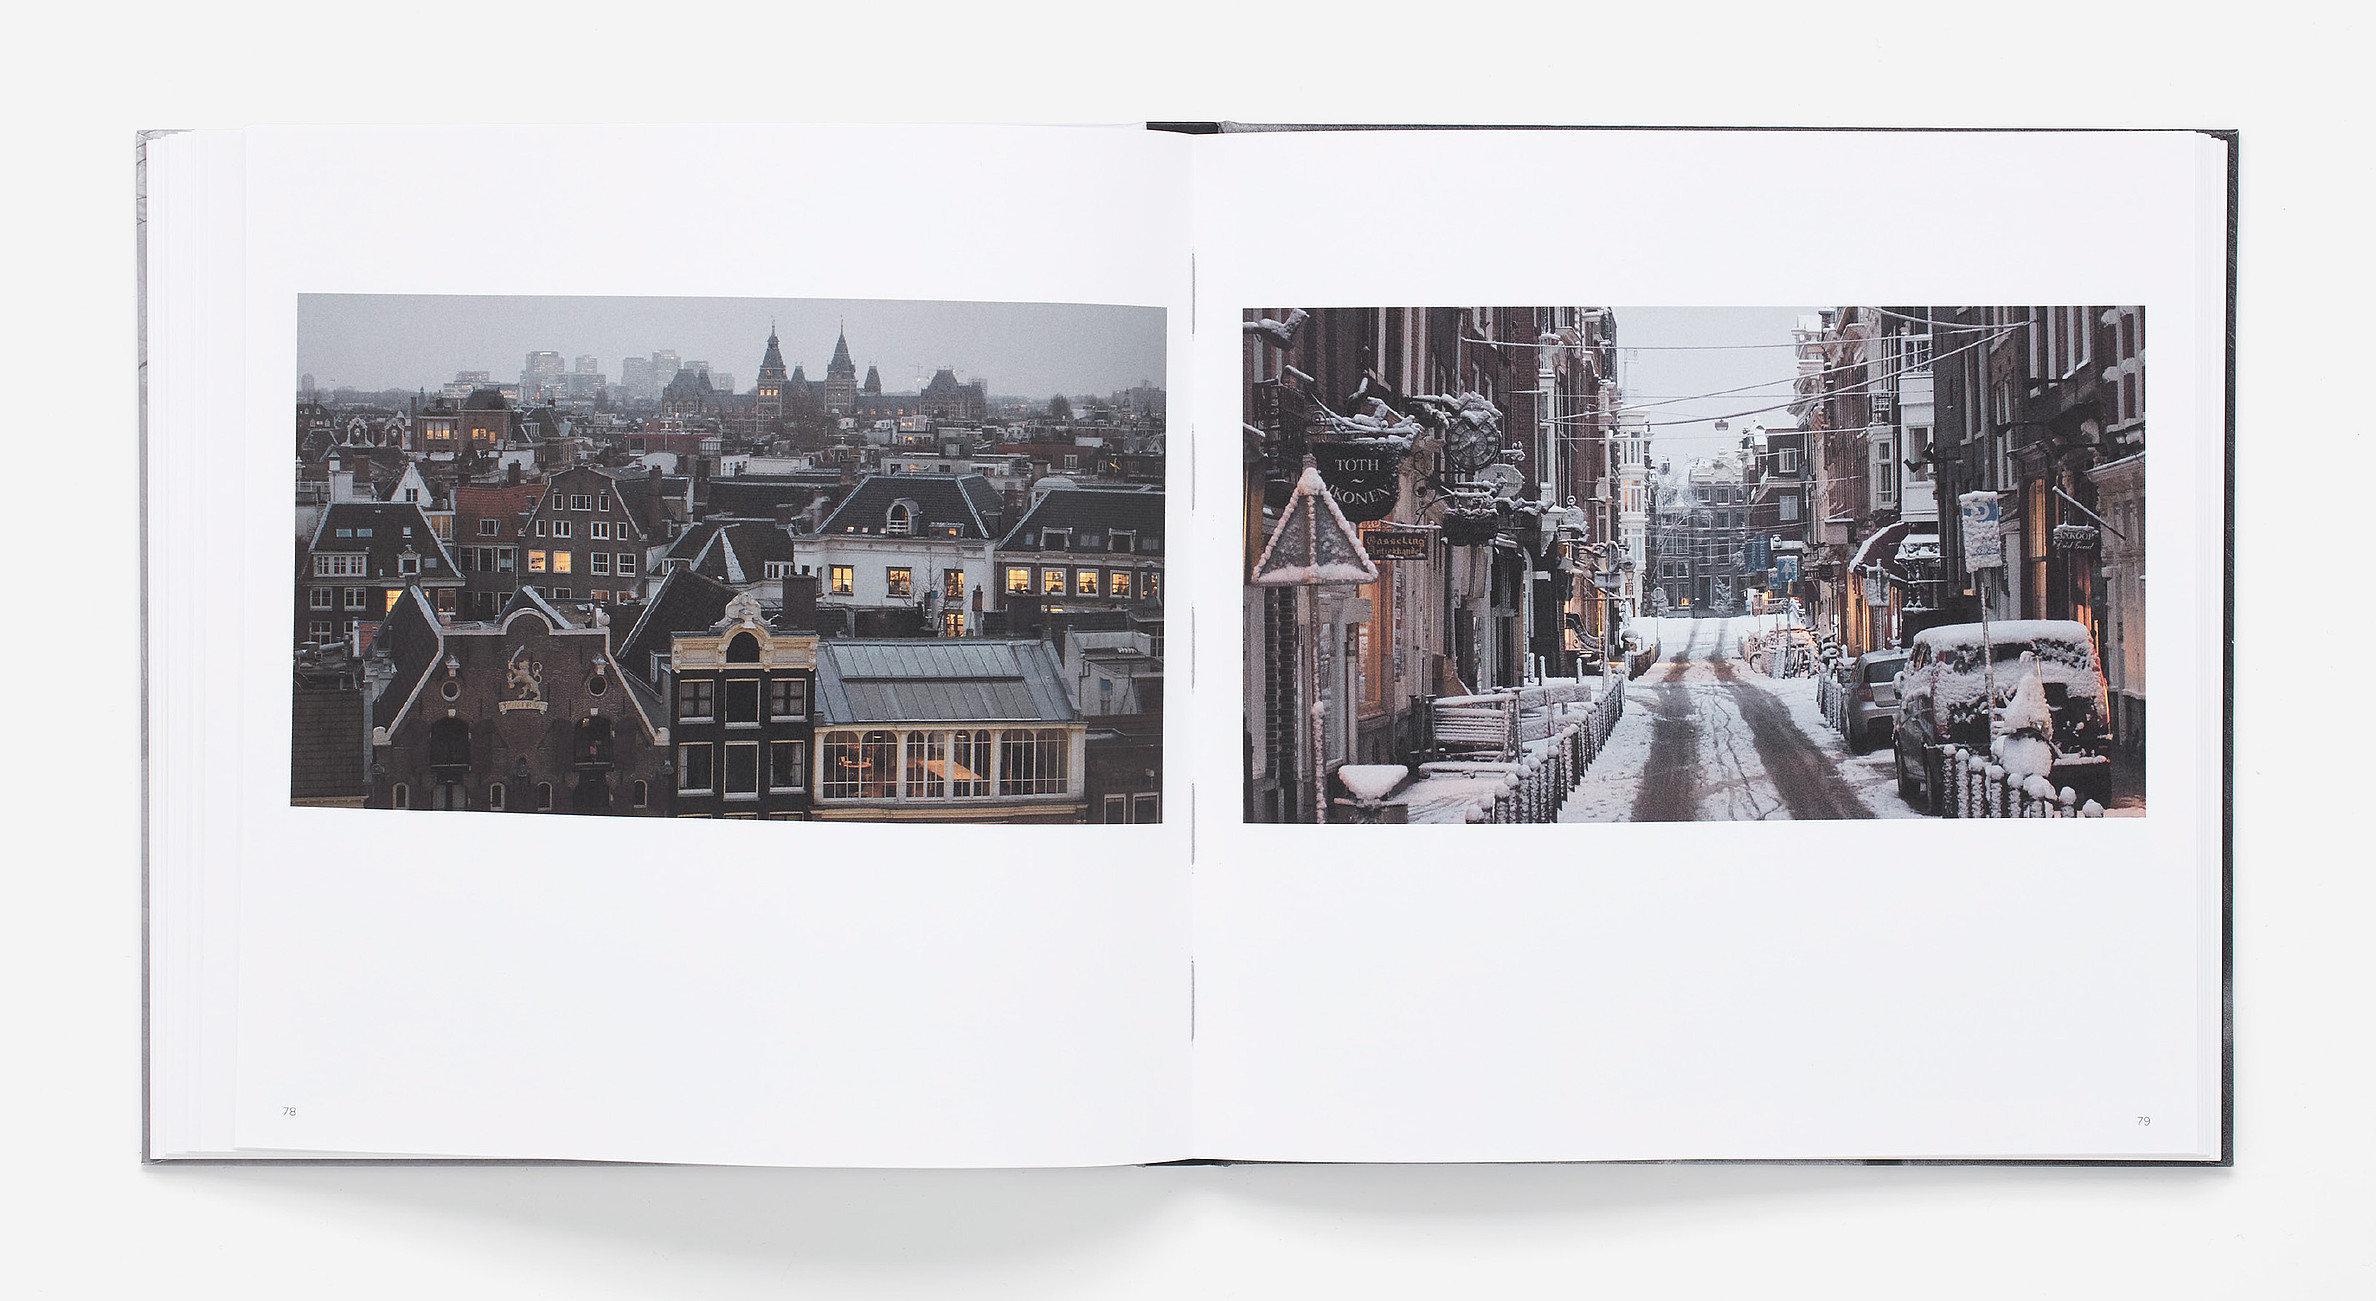 csm_Pim-Kops-Amsterdam-boek-3-Opera_38f4bbb1ce.jpg